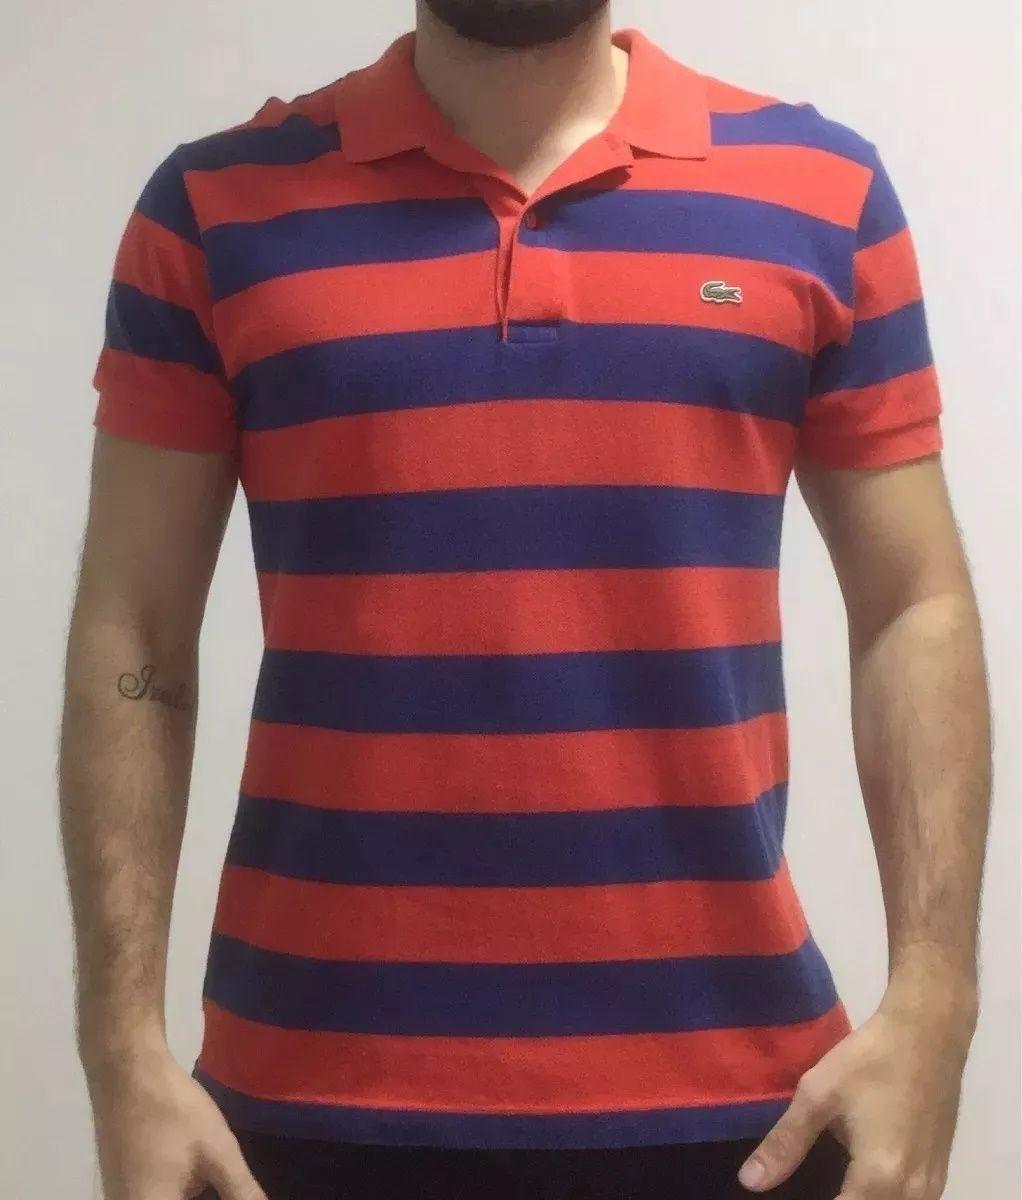 Camisa Polo Lacoste Listrada Original Camisa Masculina Lacoste